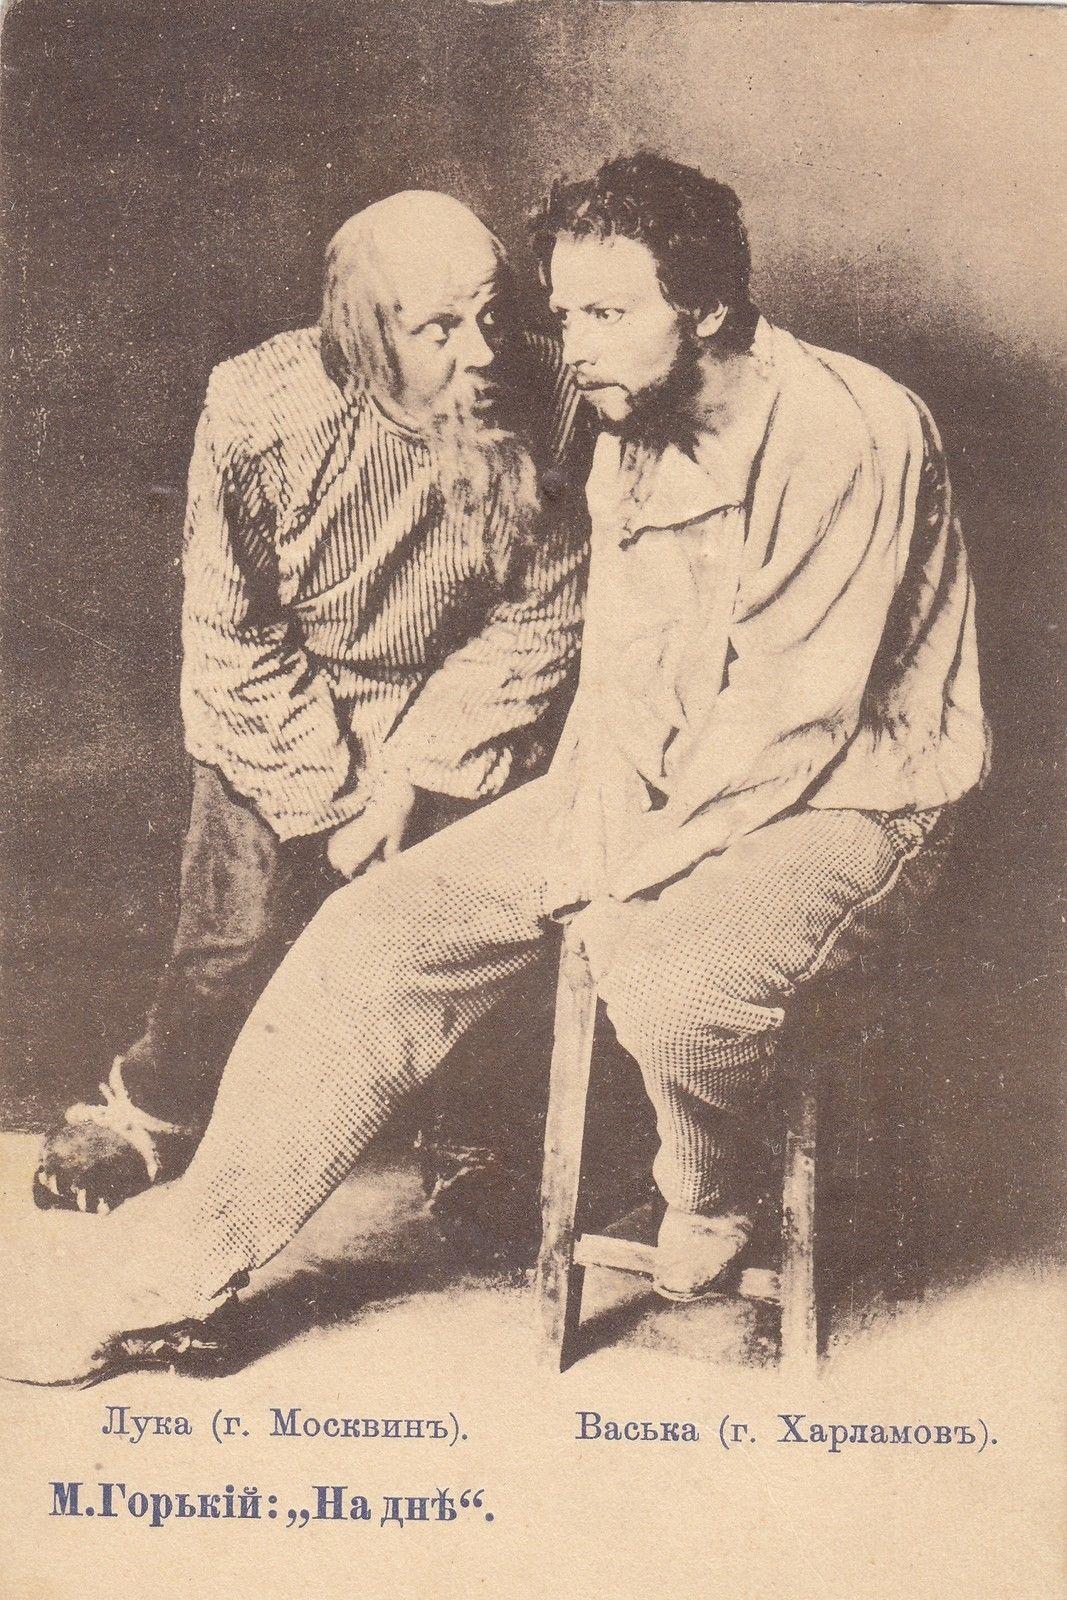 Лука (Москвин), Васька (Харламов)